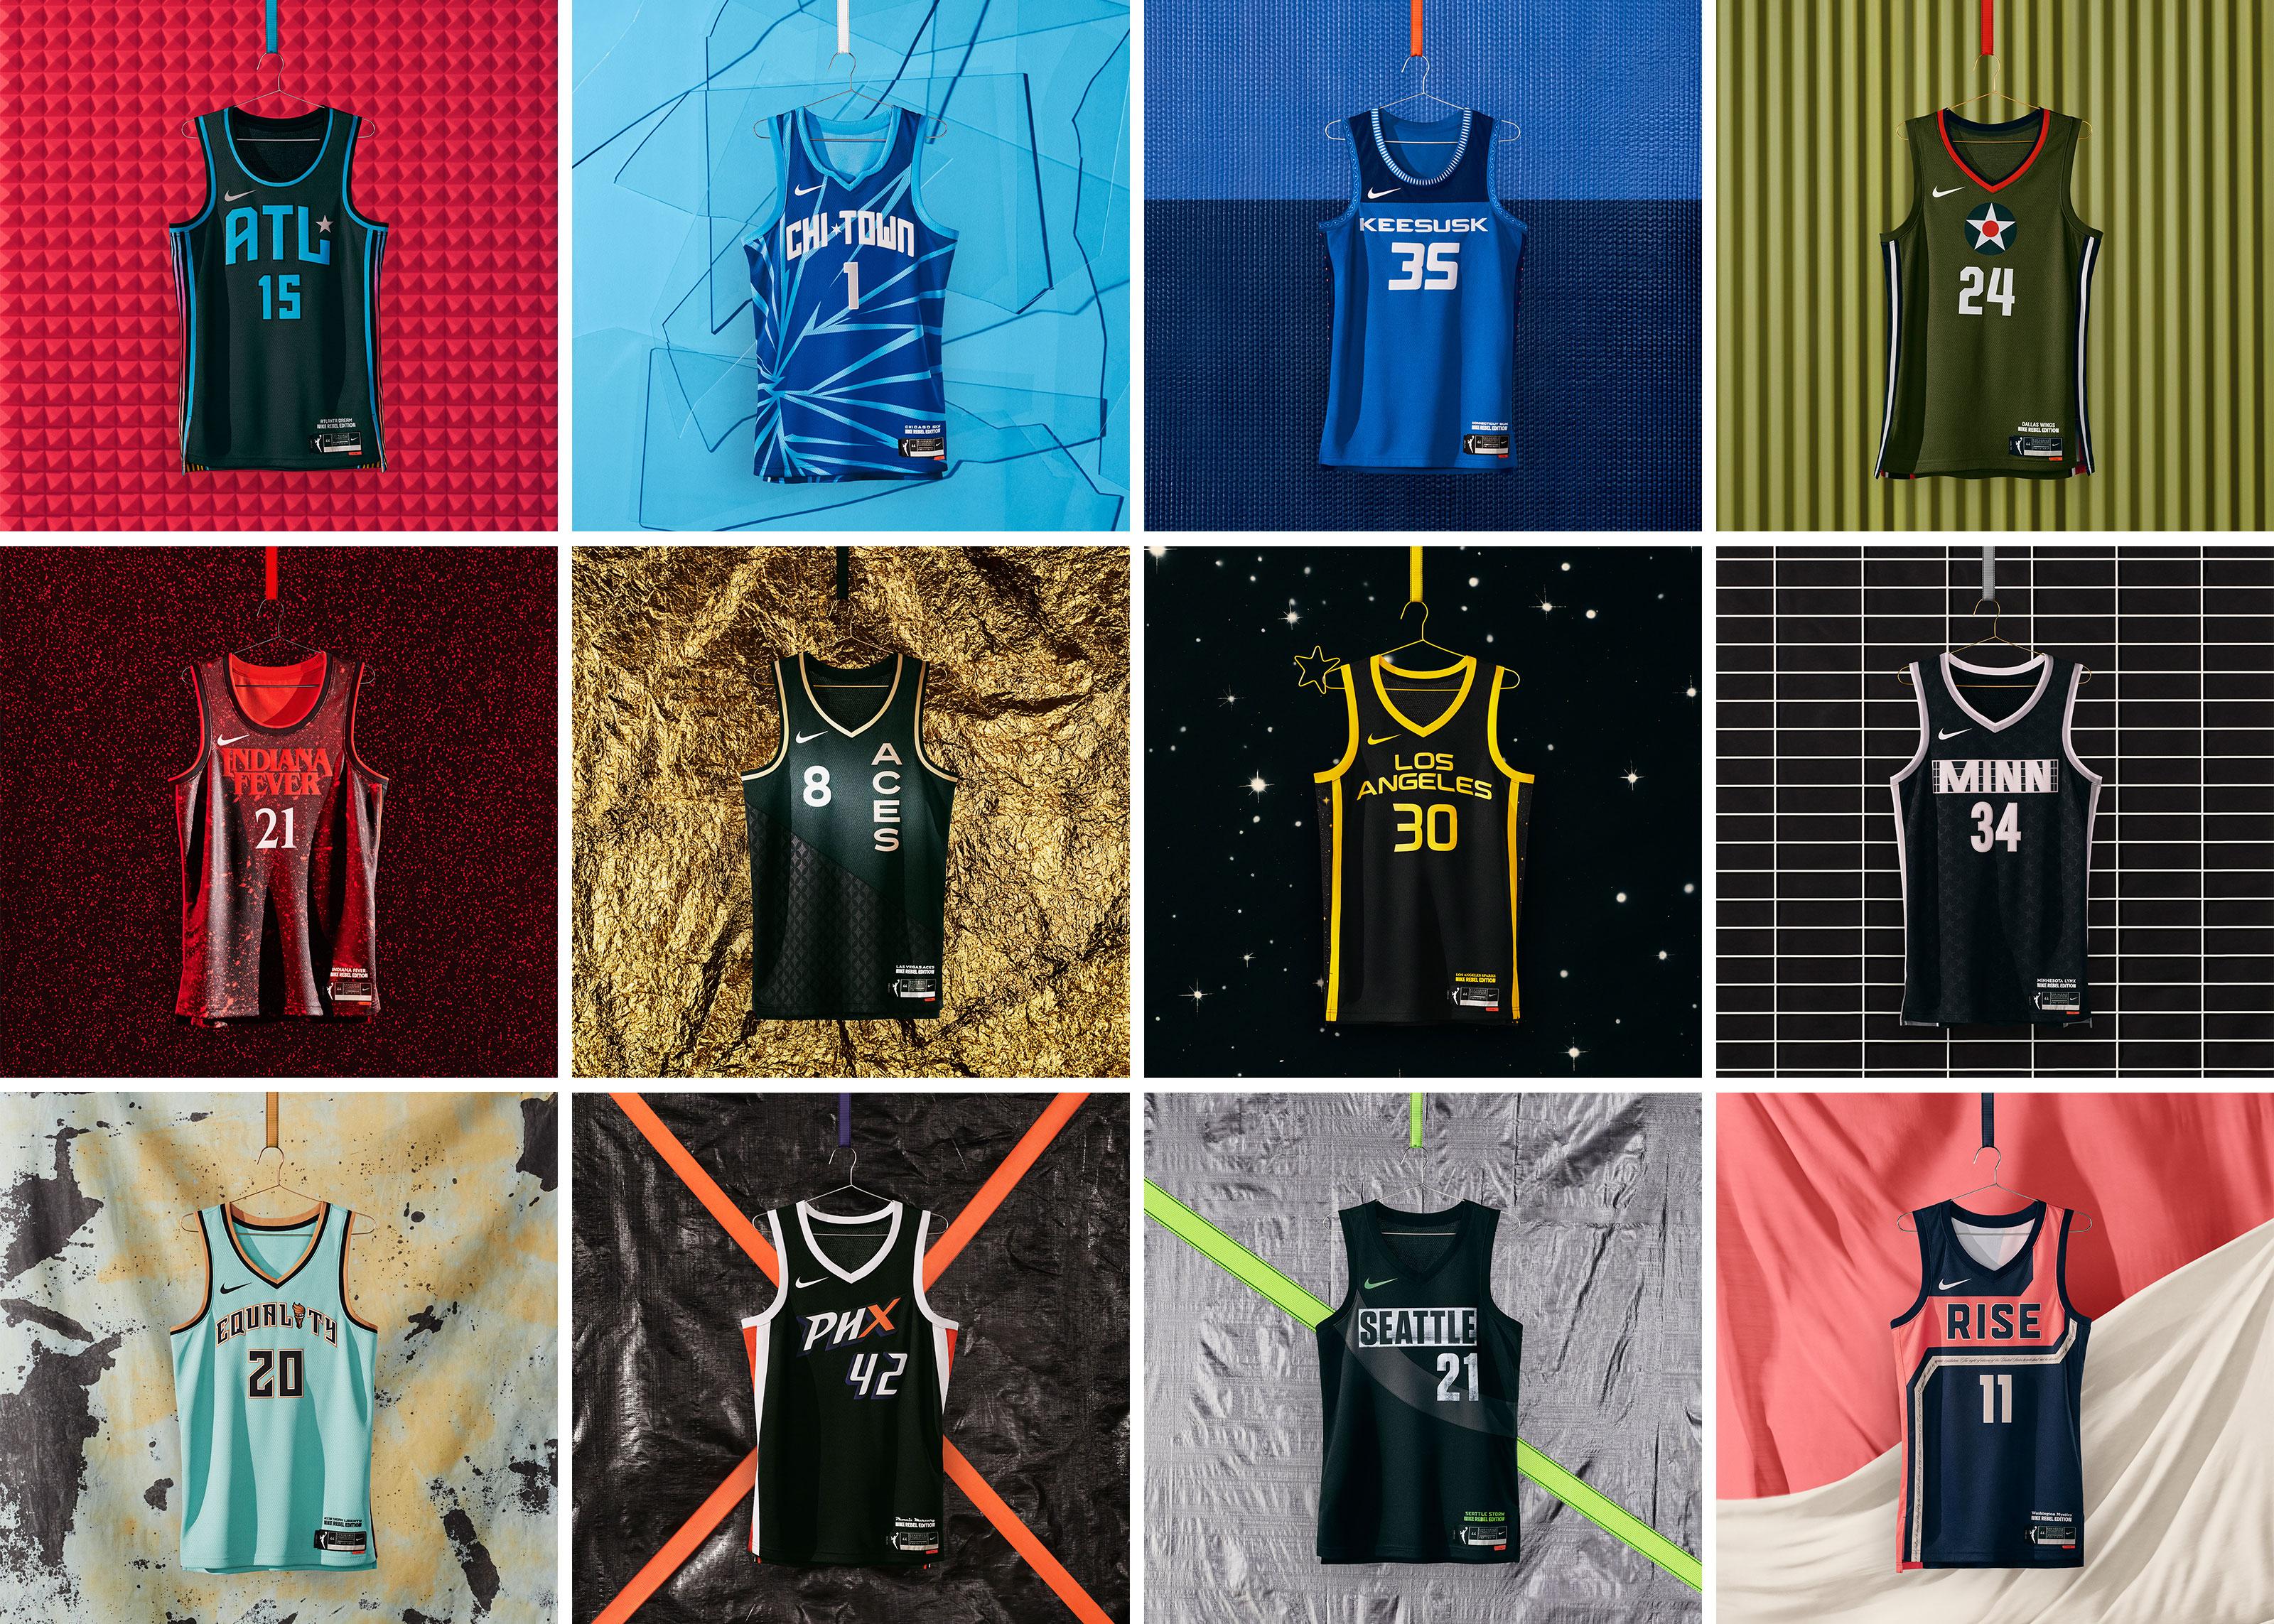 WNBA Rebel jerseys